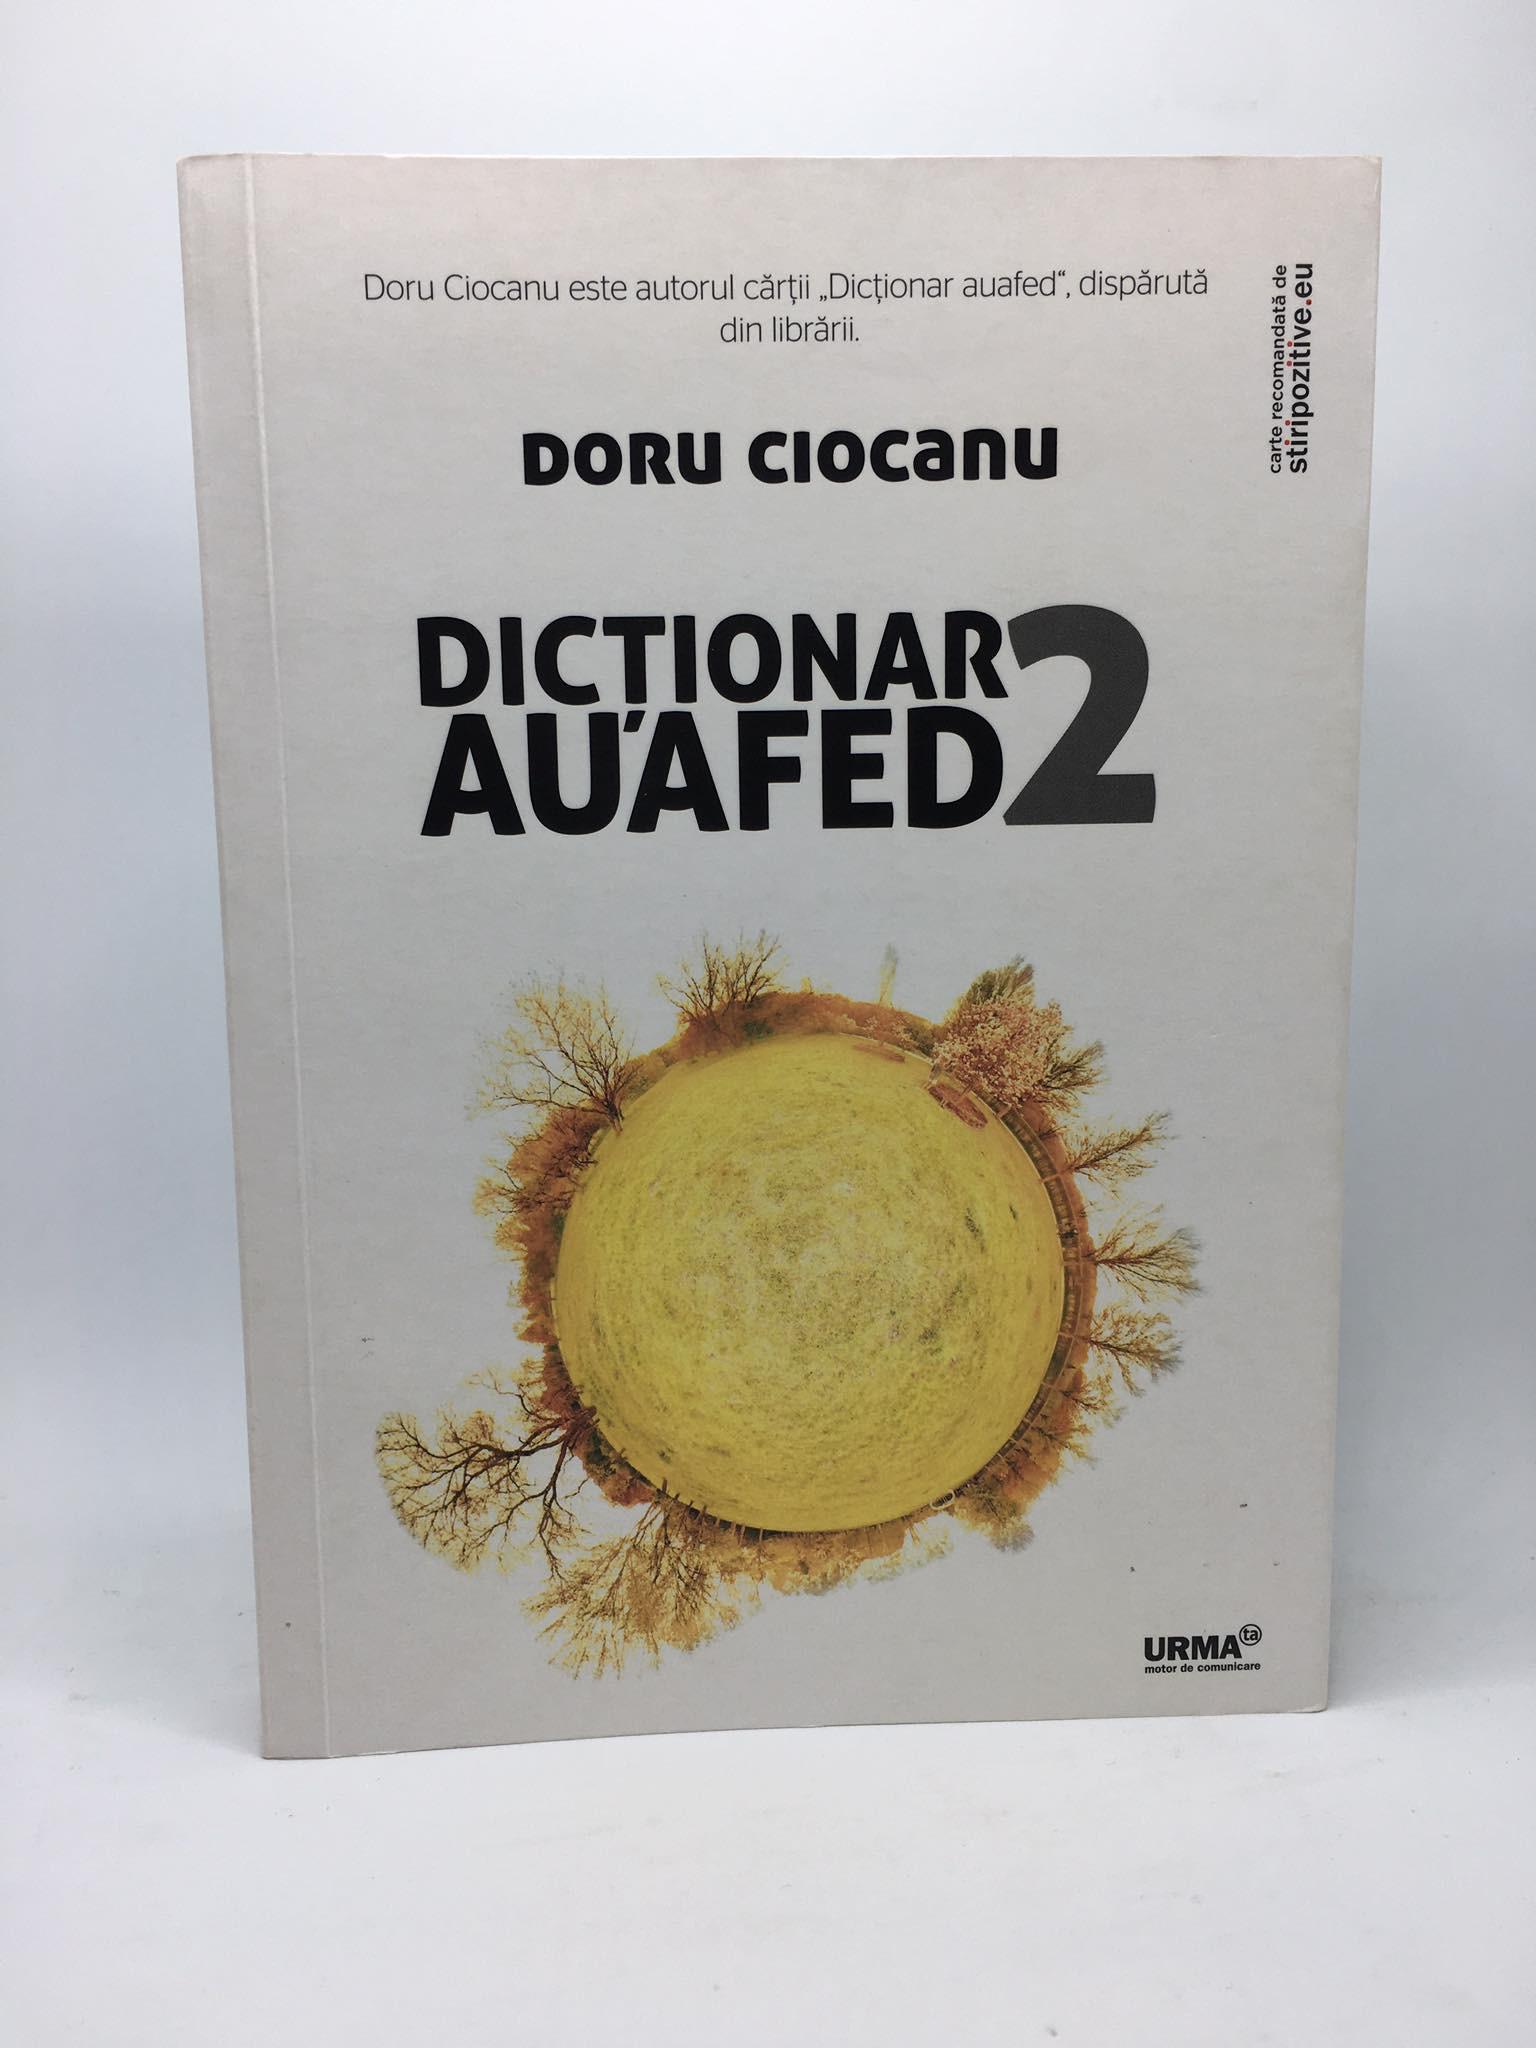 Dicţionar Auafed-2